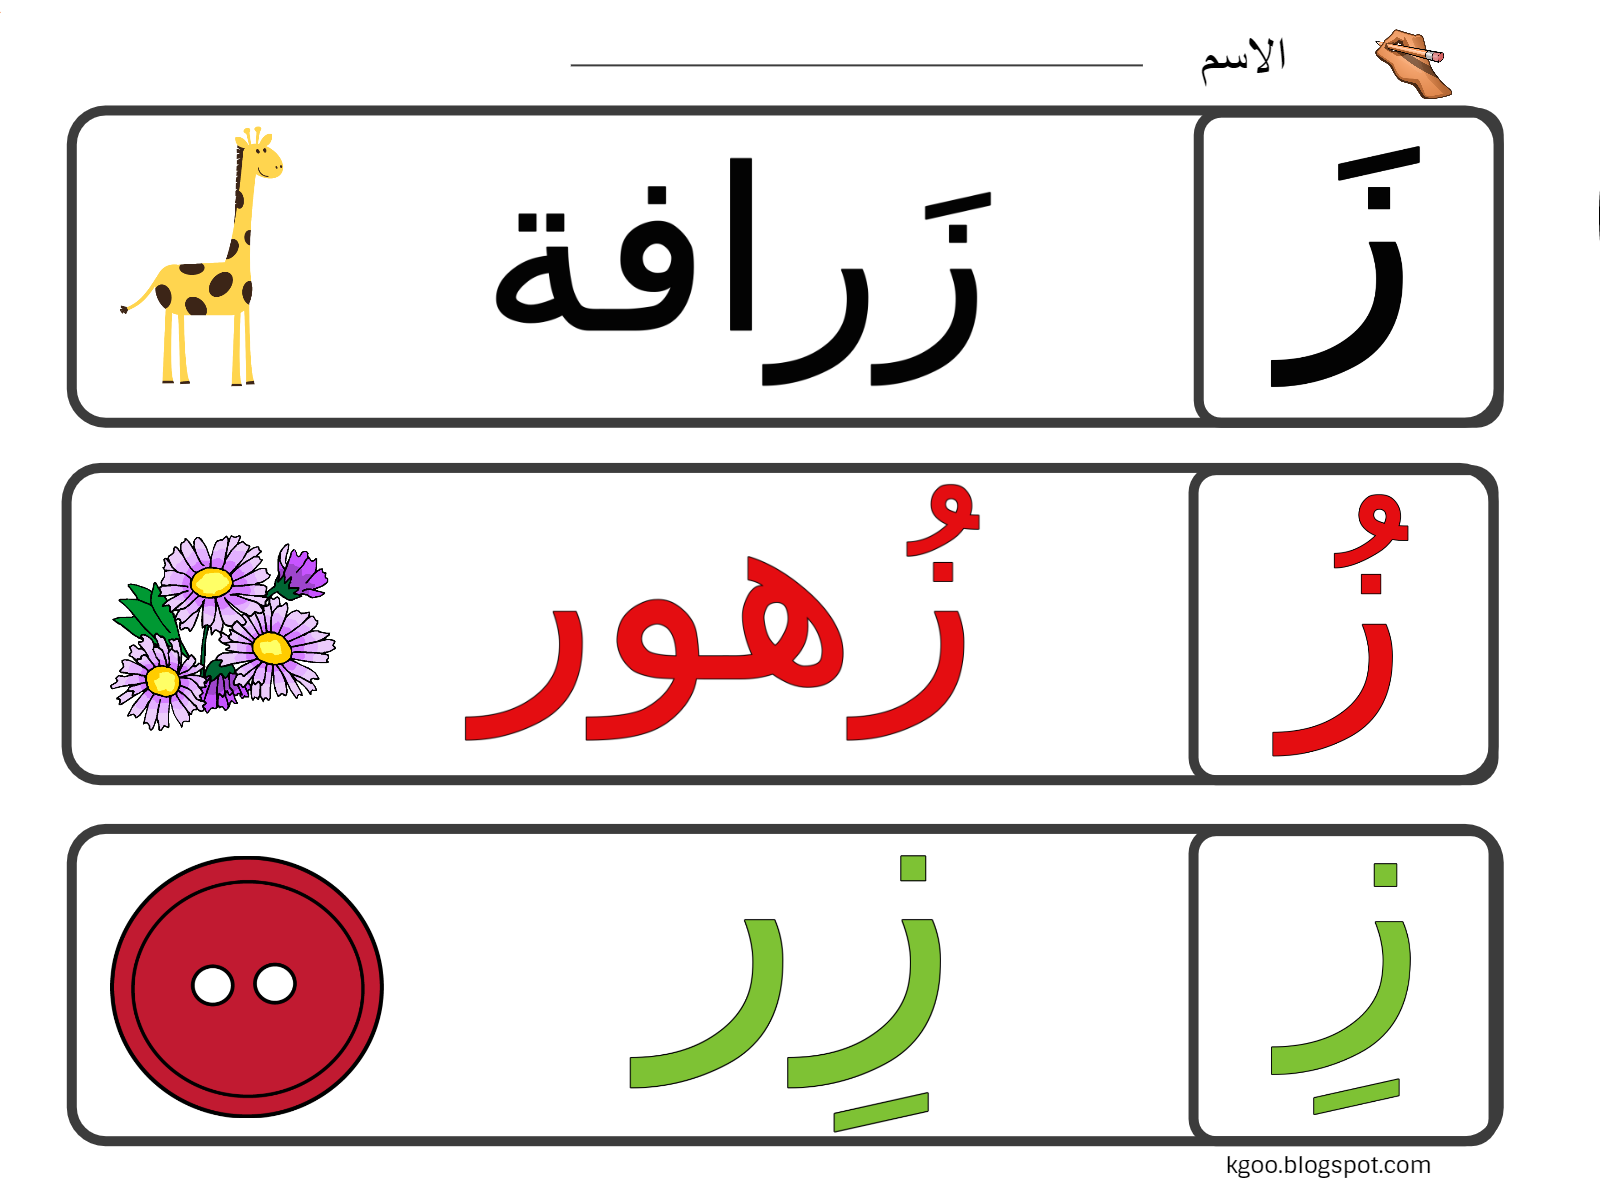 اوراق عمل جديدة حرف الزاي Zai ز Arabic Alphabet For Kids Arabic Alphabet Arabic Alphabet Letters